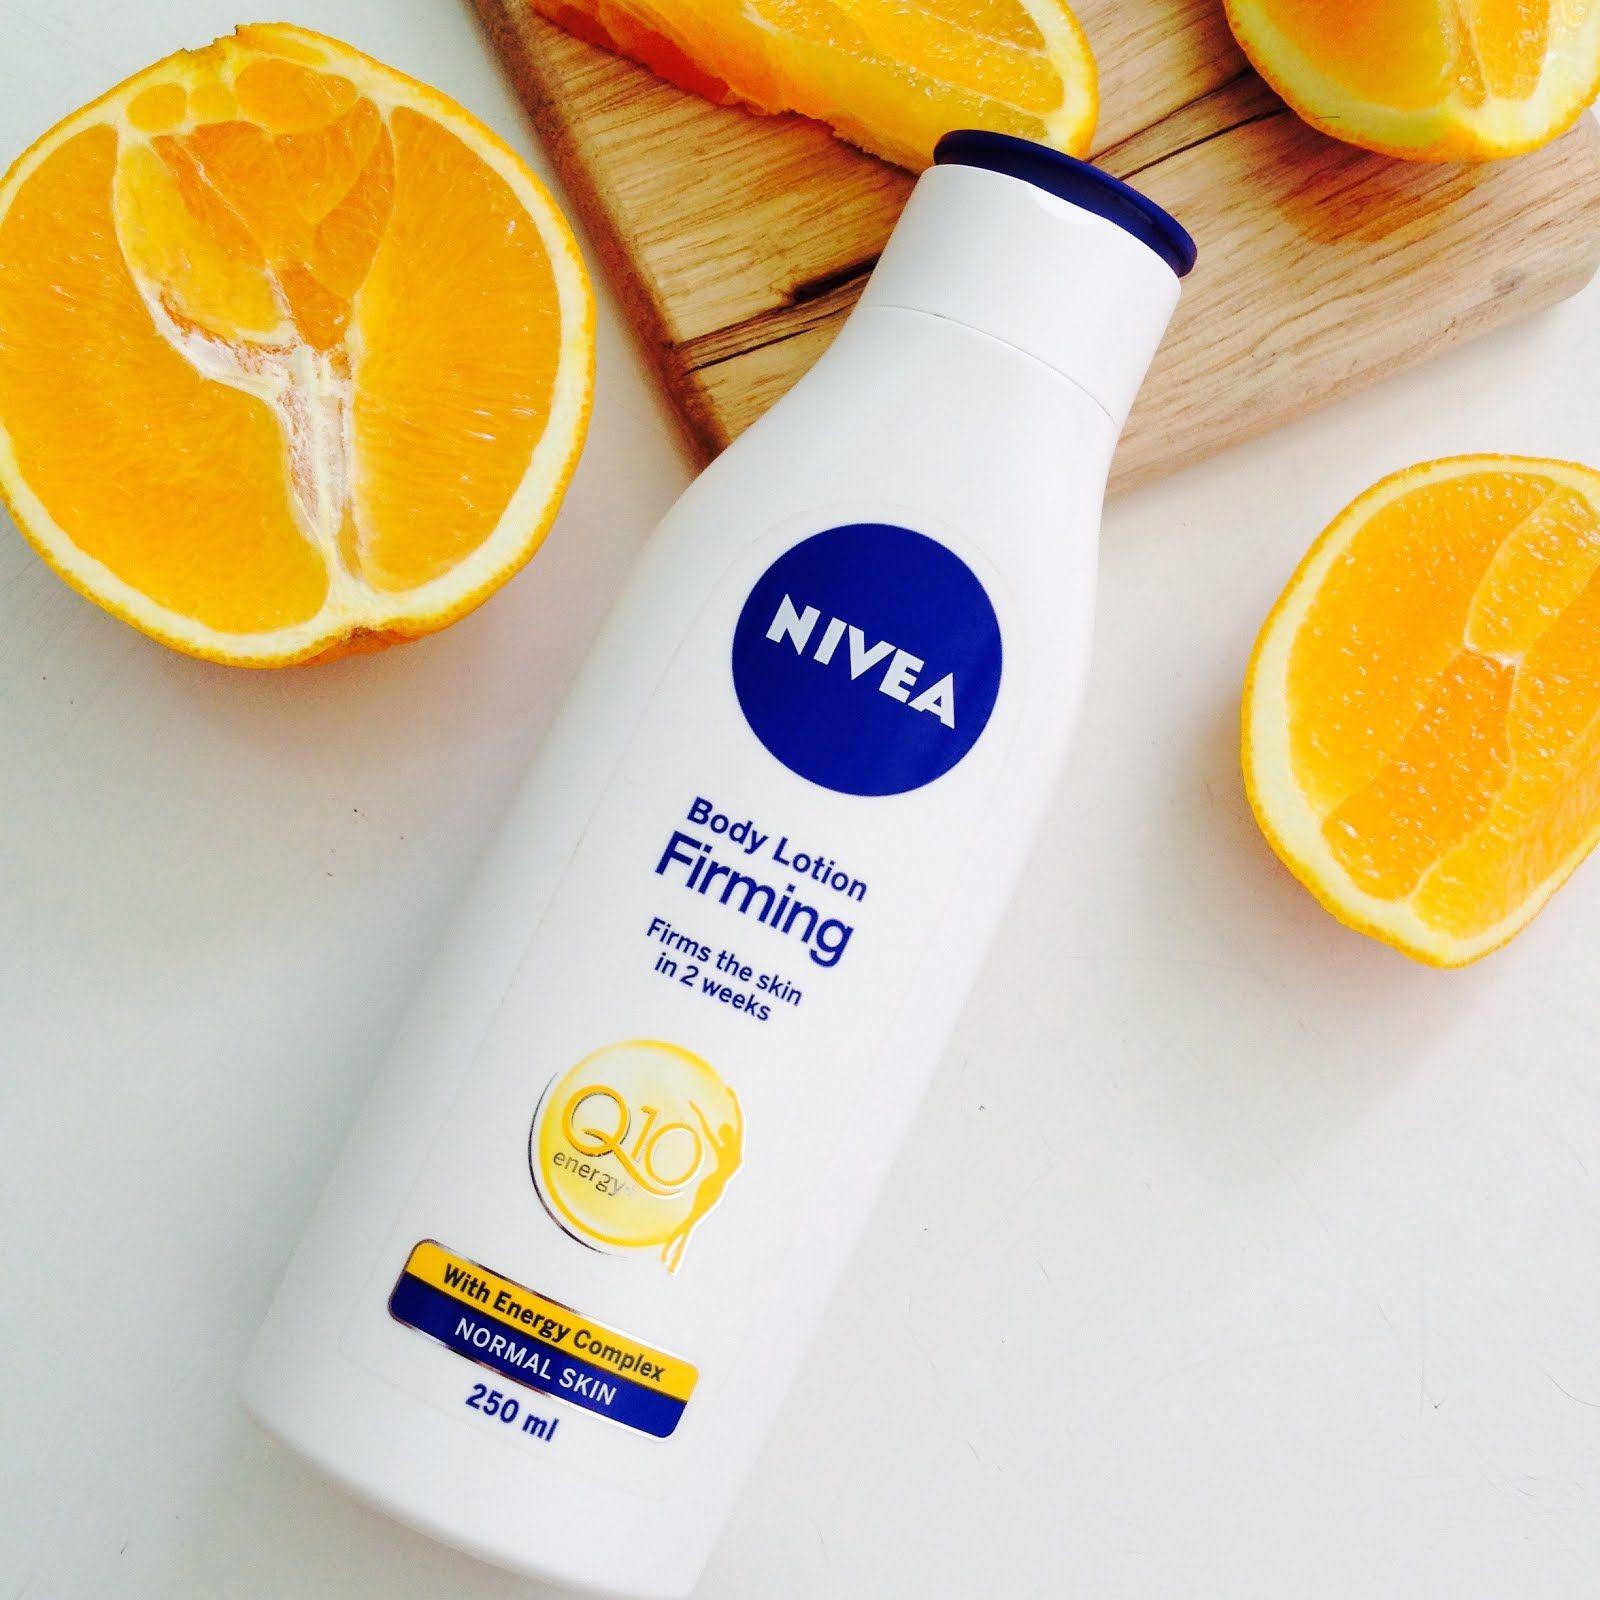 Nivea firming body lotion review Lotion, Body lotion, Nivea